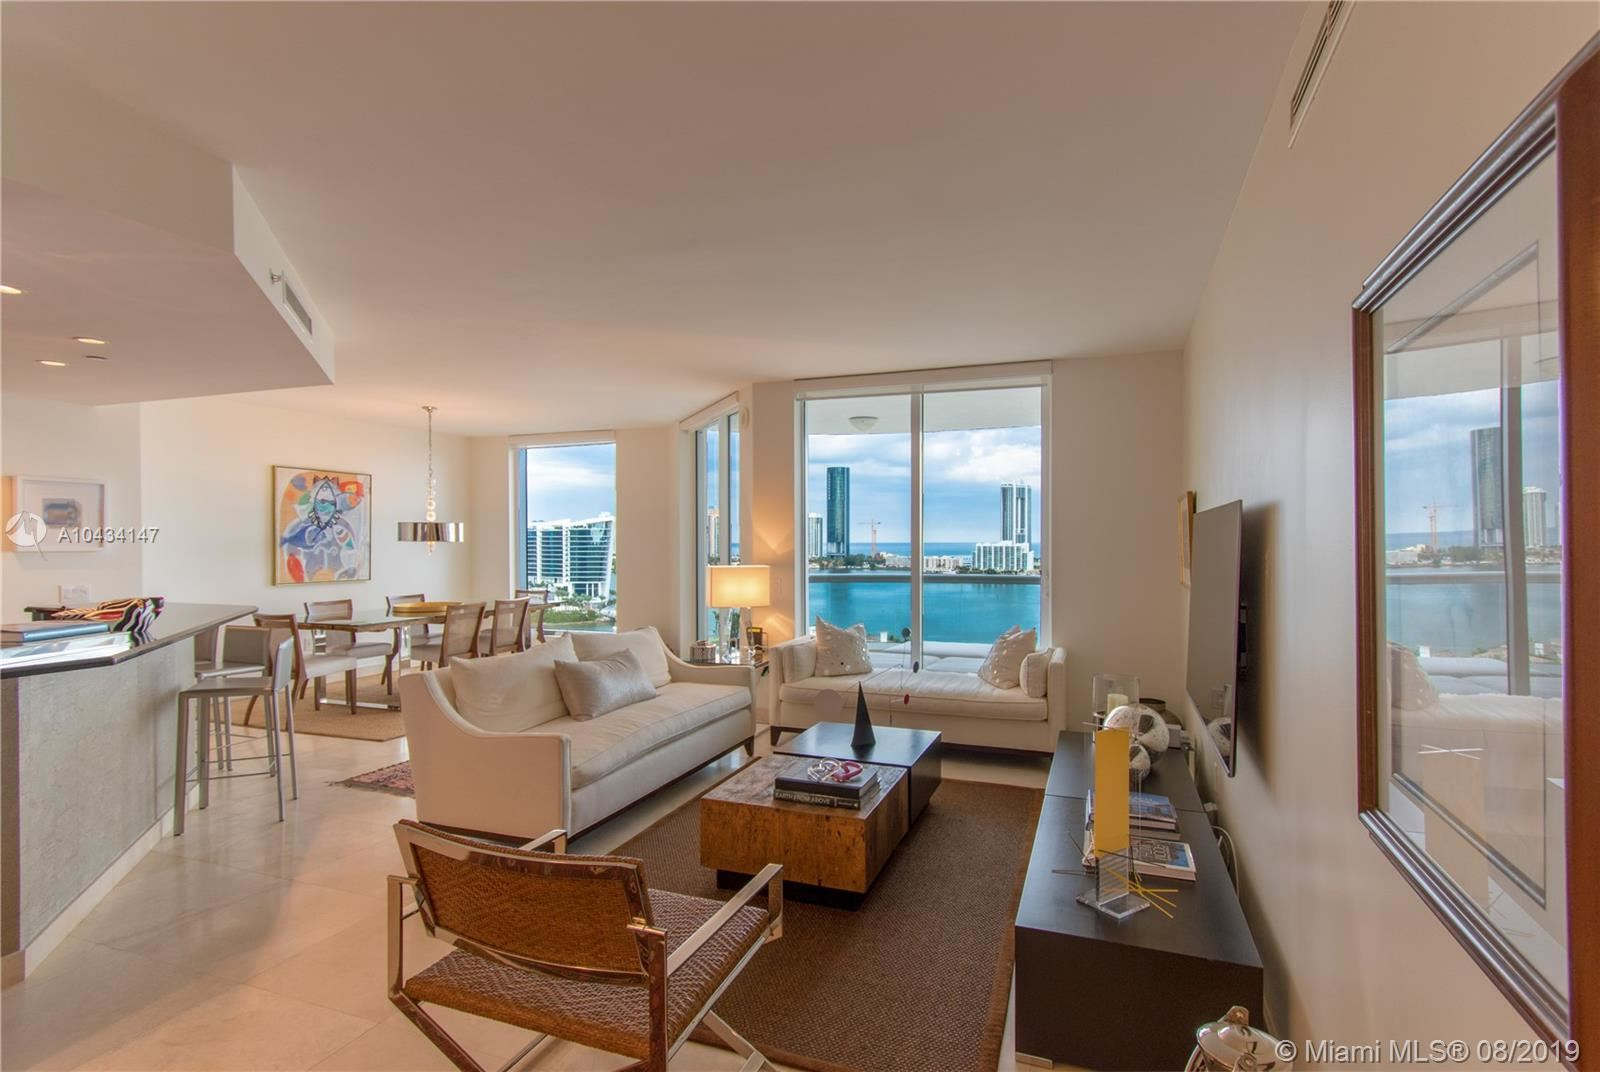 6000 Island Blvd #1604, Aventura, FL 33160 - #: A10434147